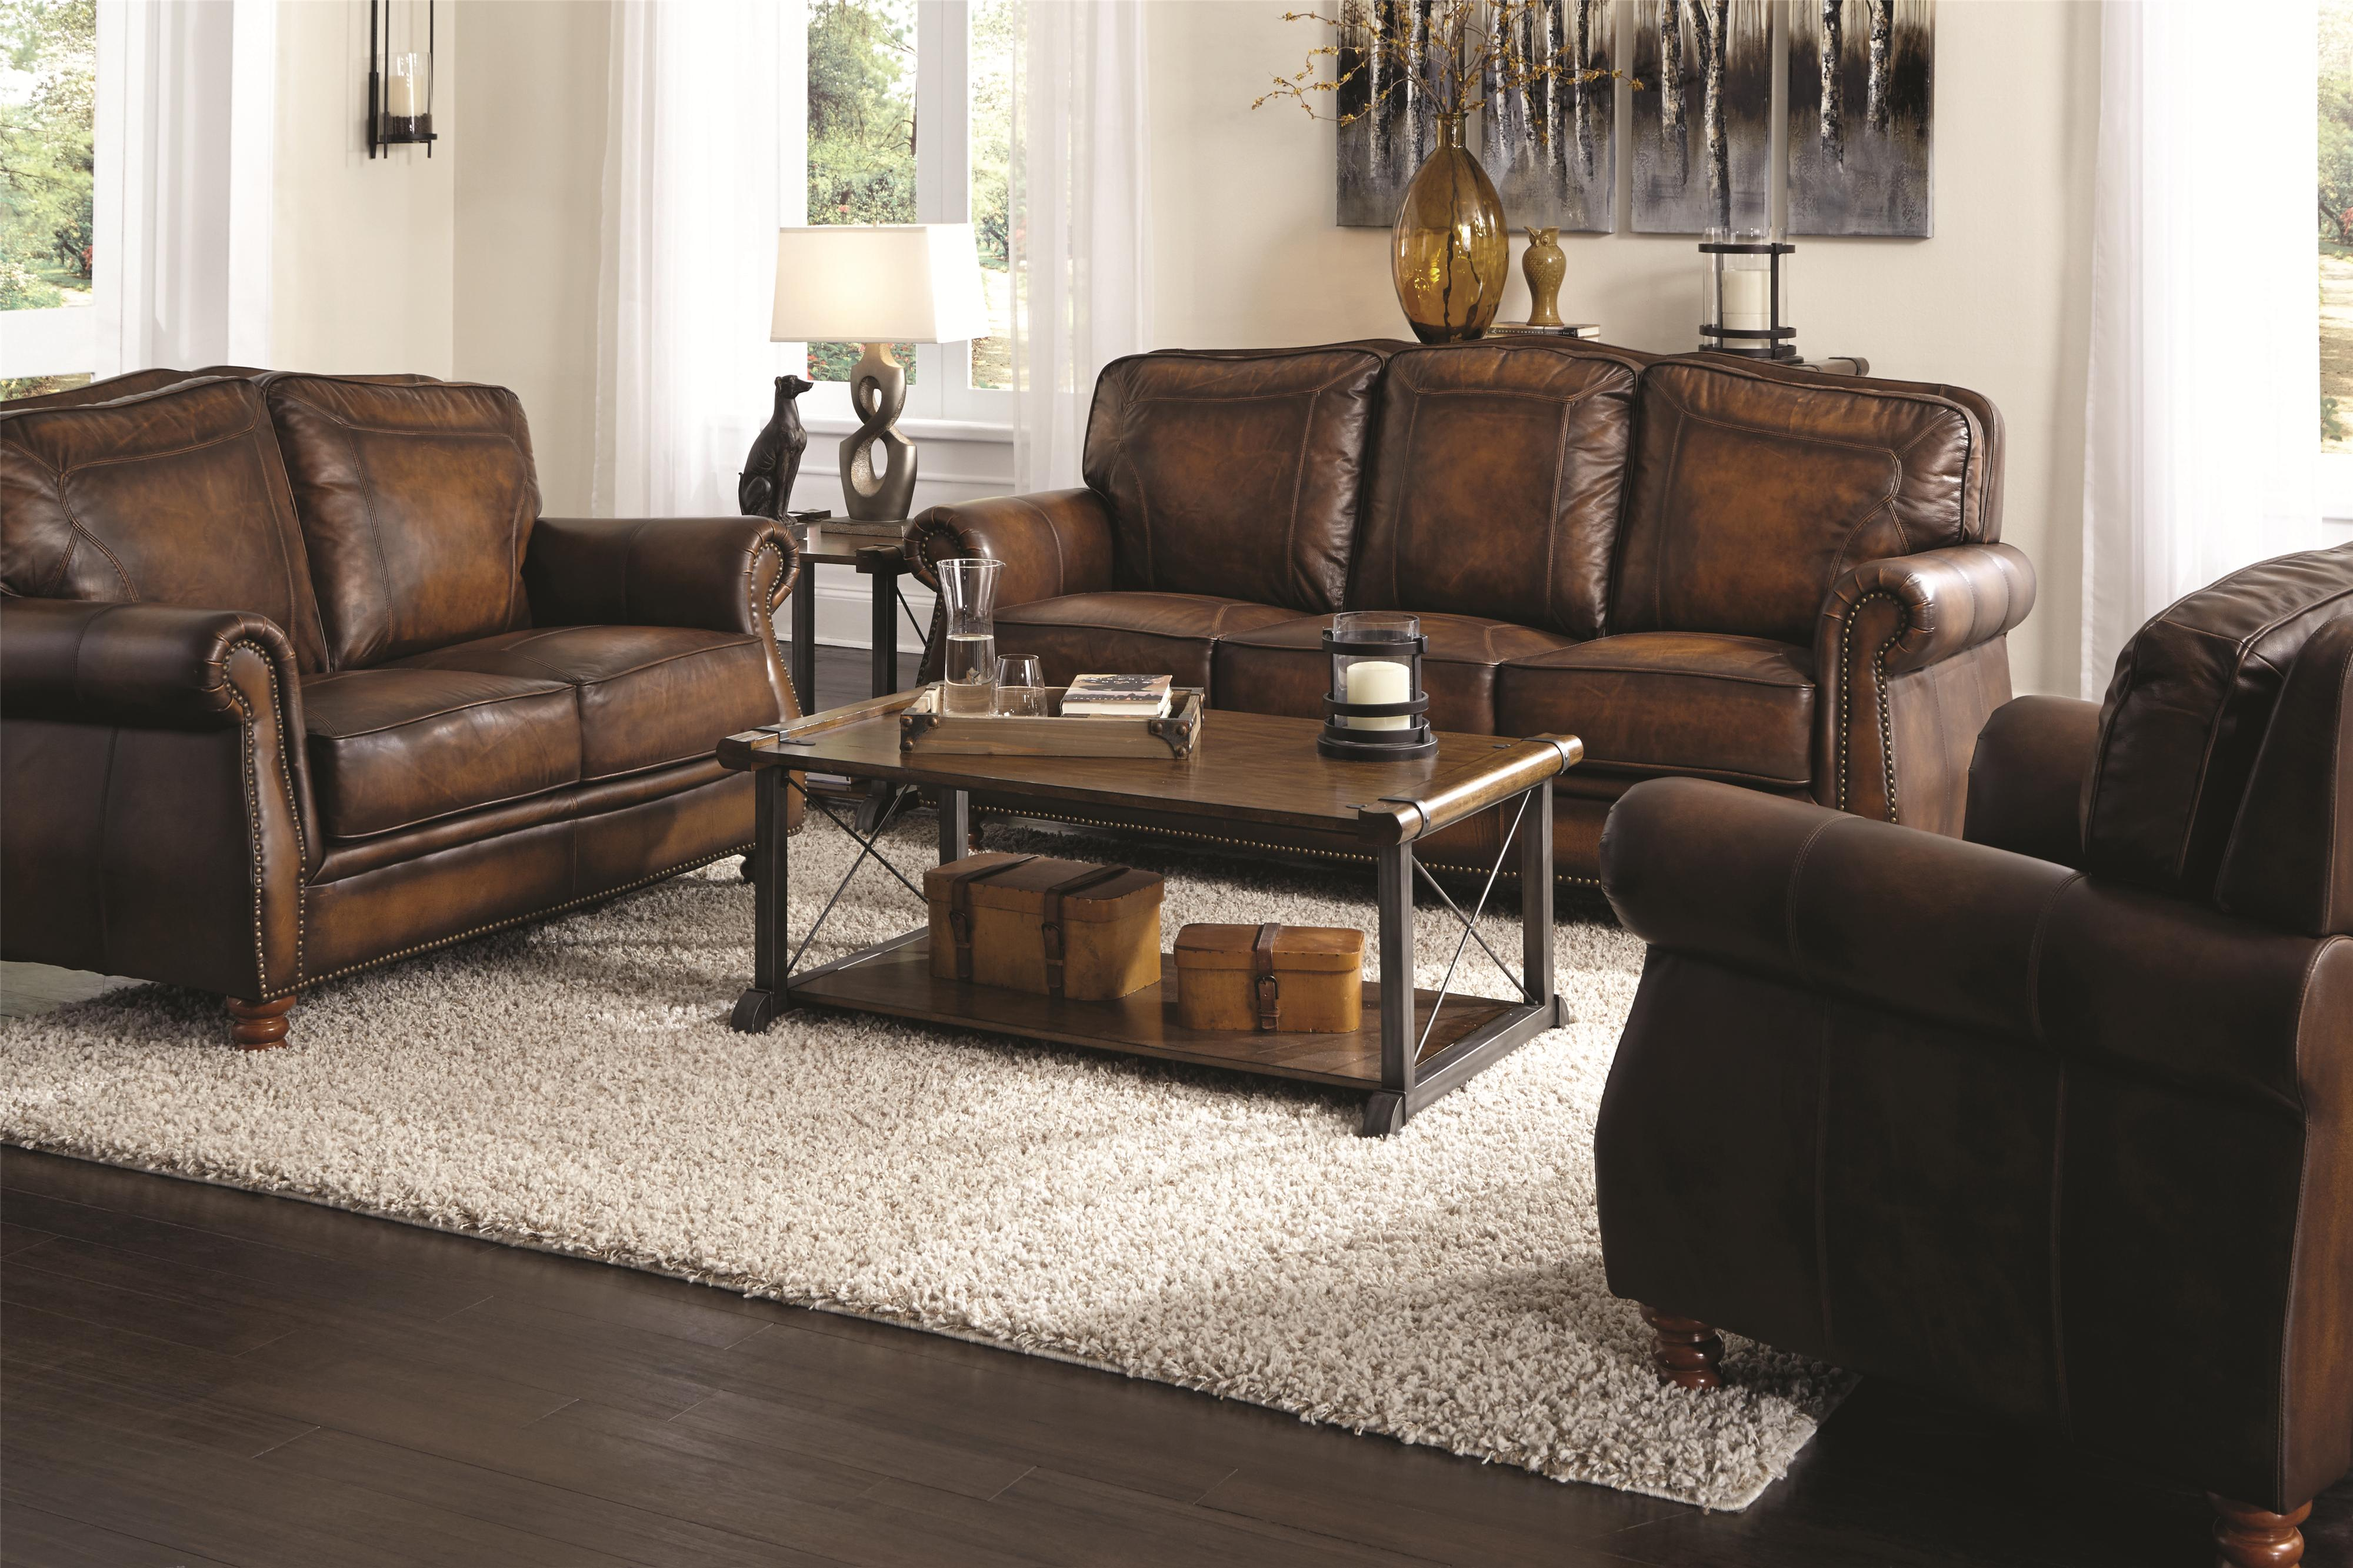 Coaster Montbrook 503981 Sofa | Northeast Factory Direct | Sofas Cleveland,  Eastlake, Westlake, Mentor, Medina, Ohio